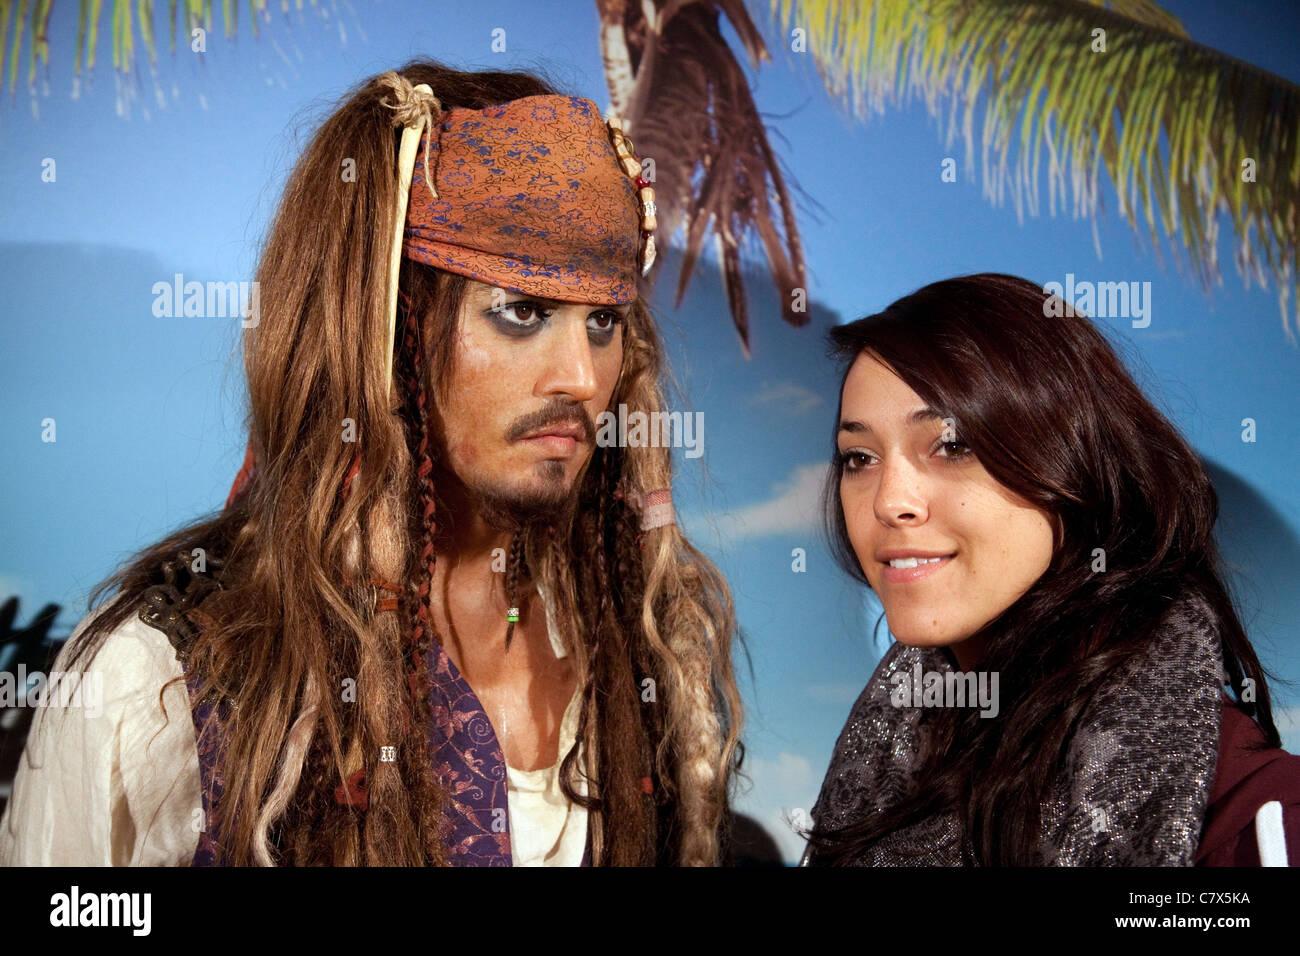 Teenage girl having her photo taken with waxwork of Johnny Depp as Captain Jack Sparrow, Madame Tussauds waxworks, Stock Photo